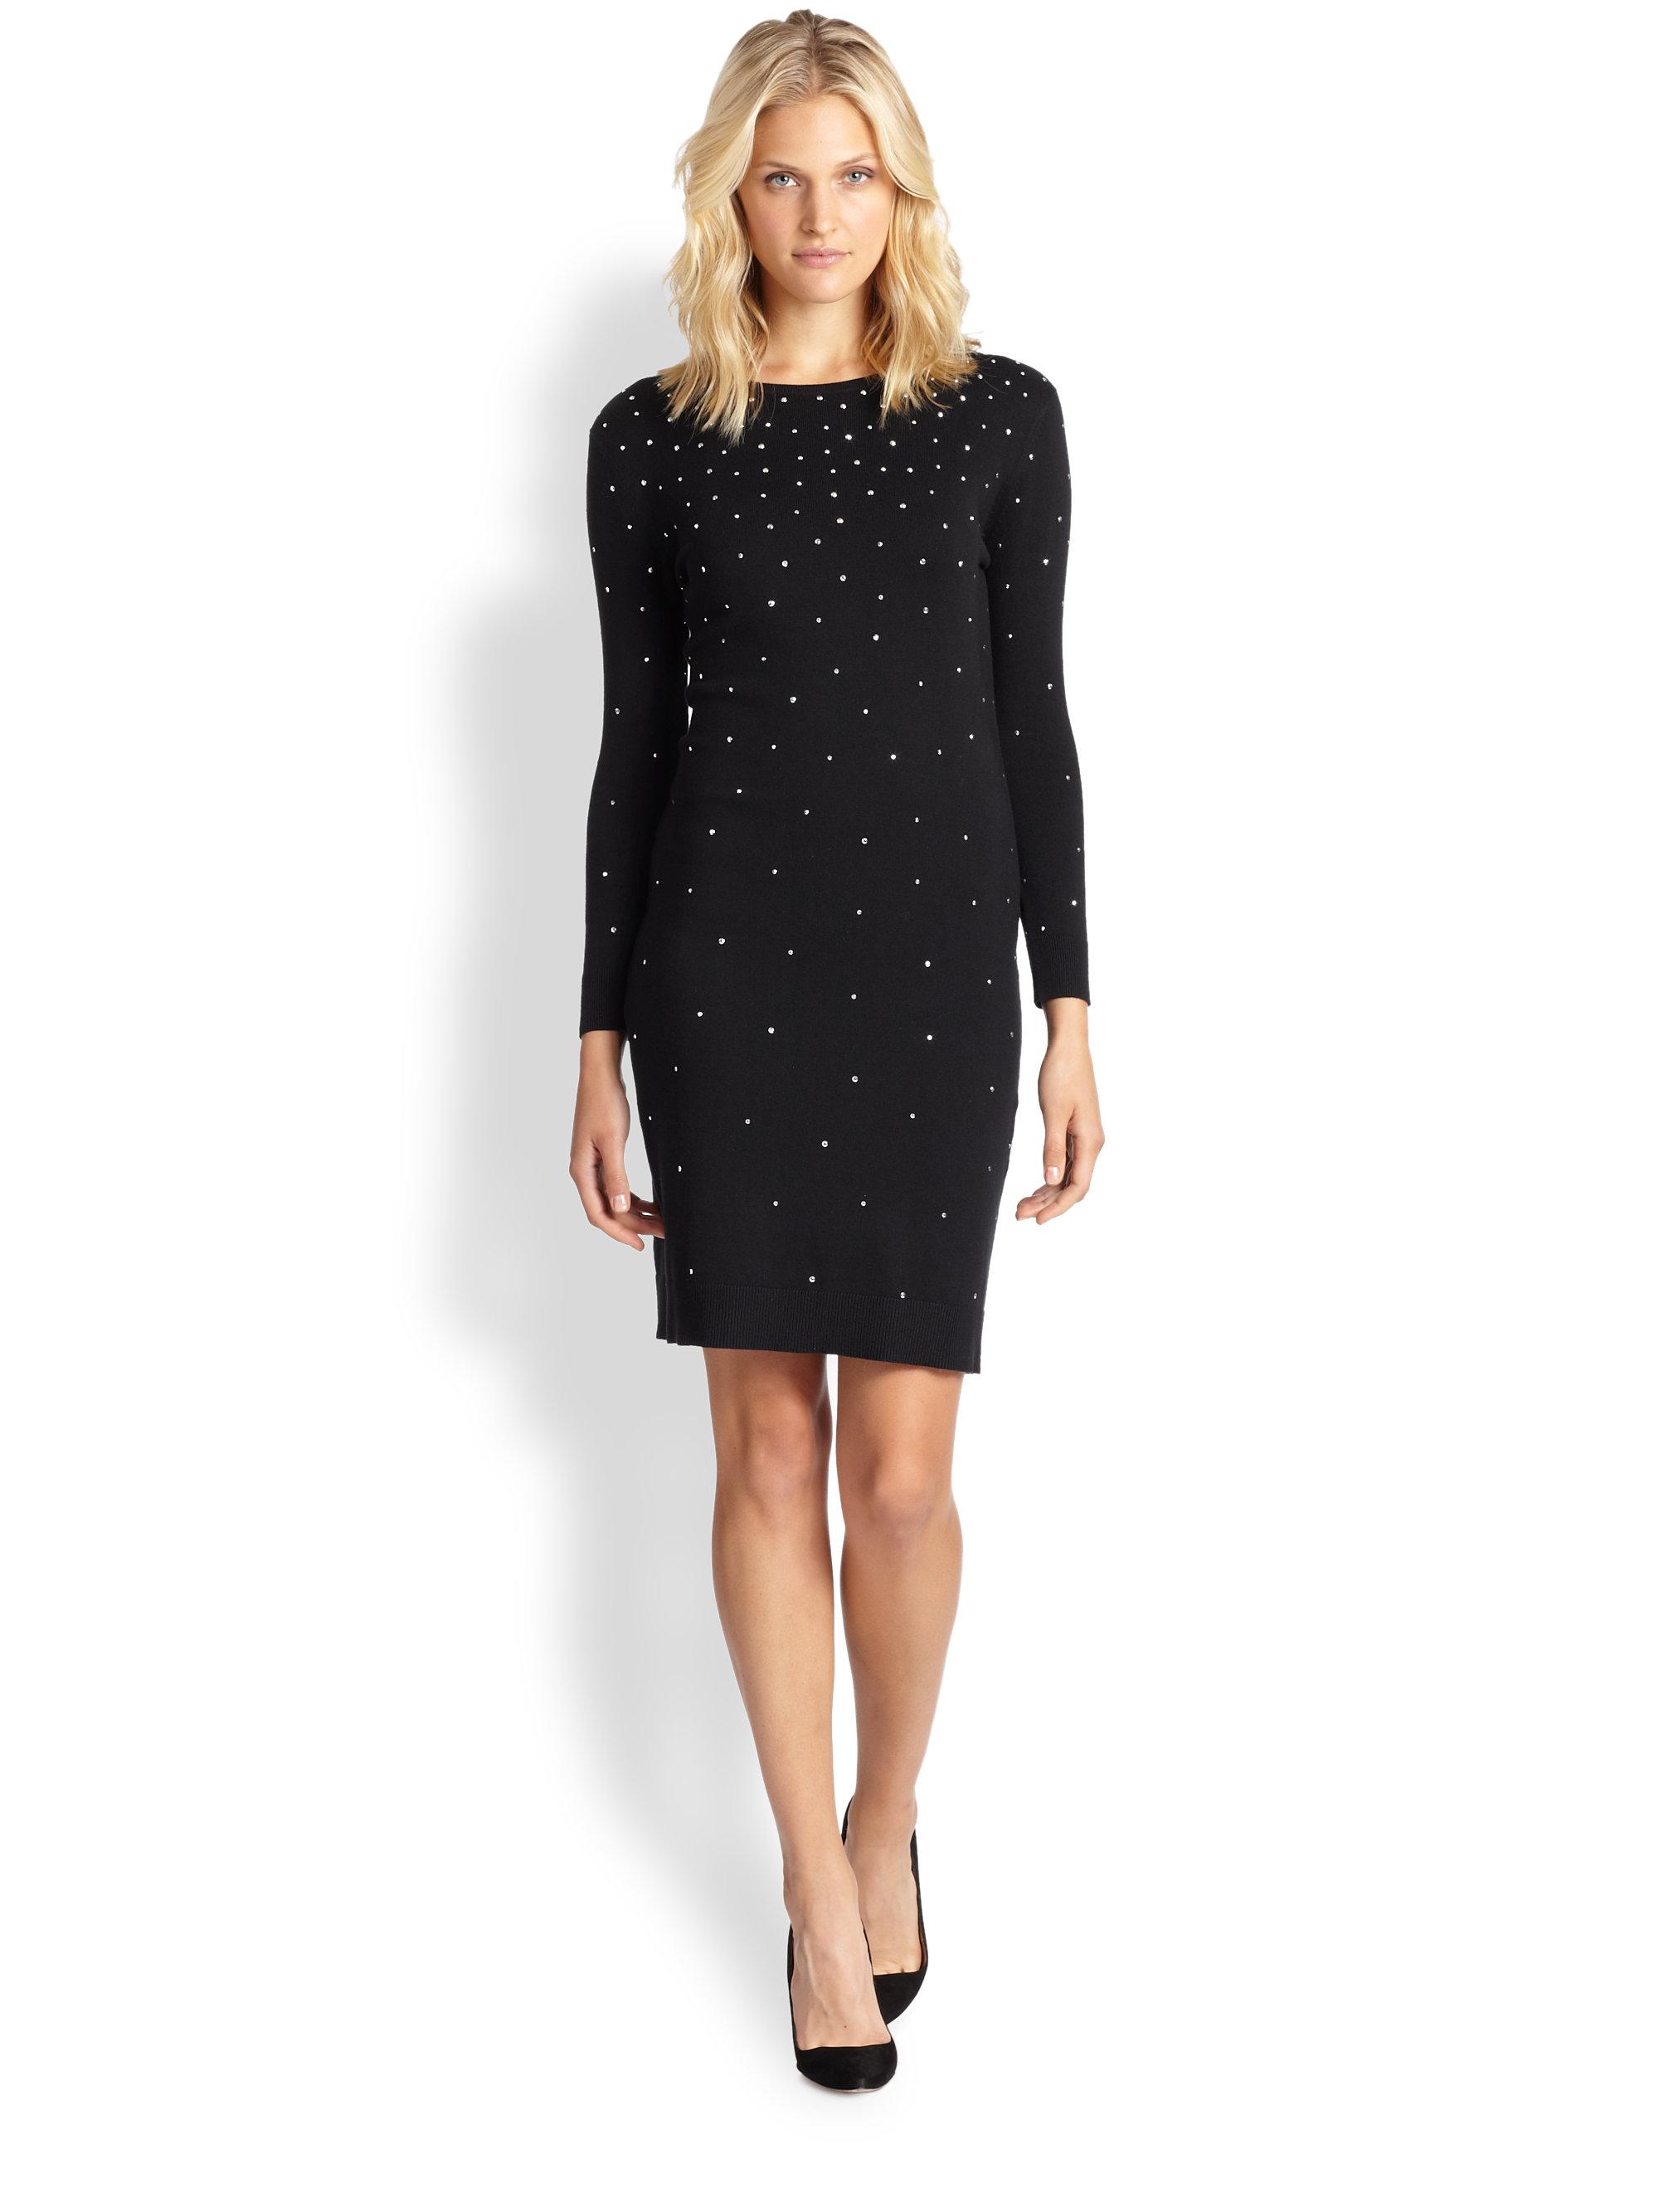 82dcbf857cc MICHAEL Michael Kors Studded Sweater Dress Petite in Black - Lyst